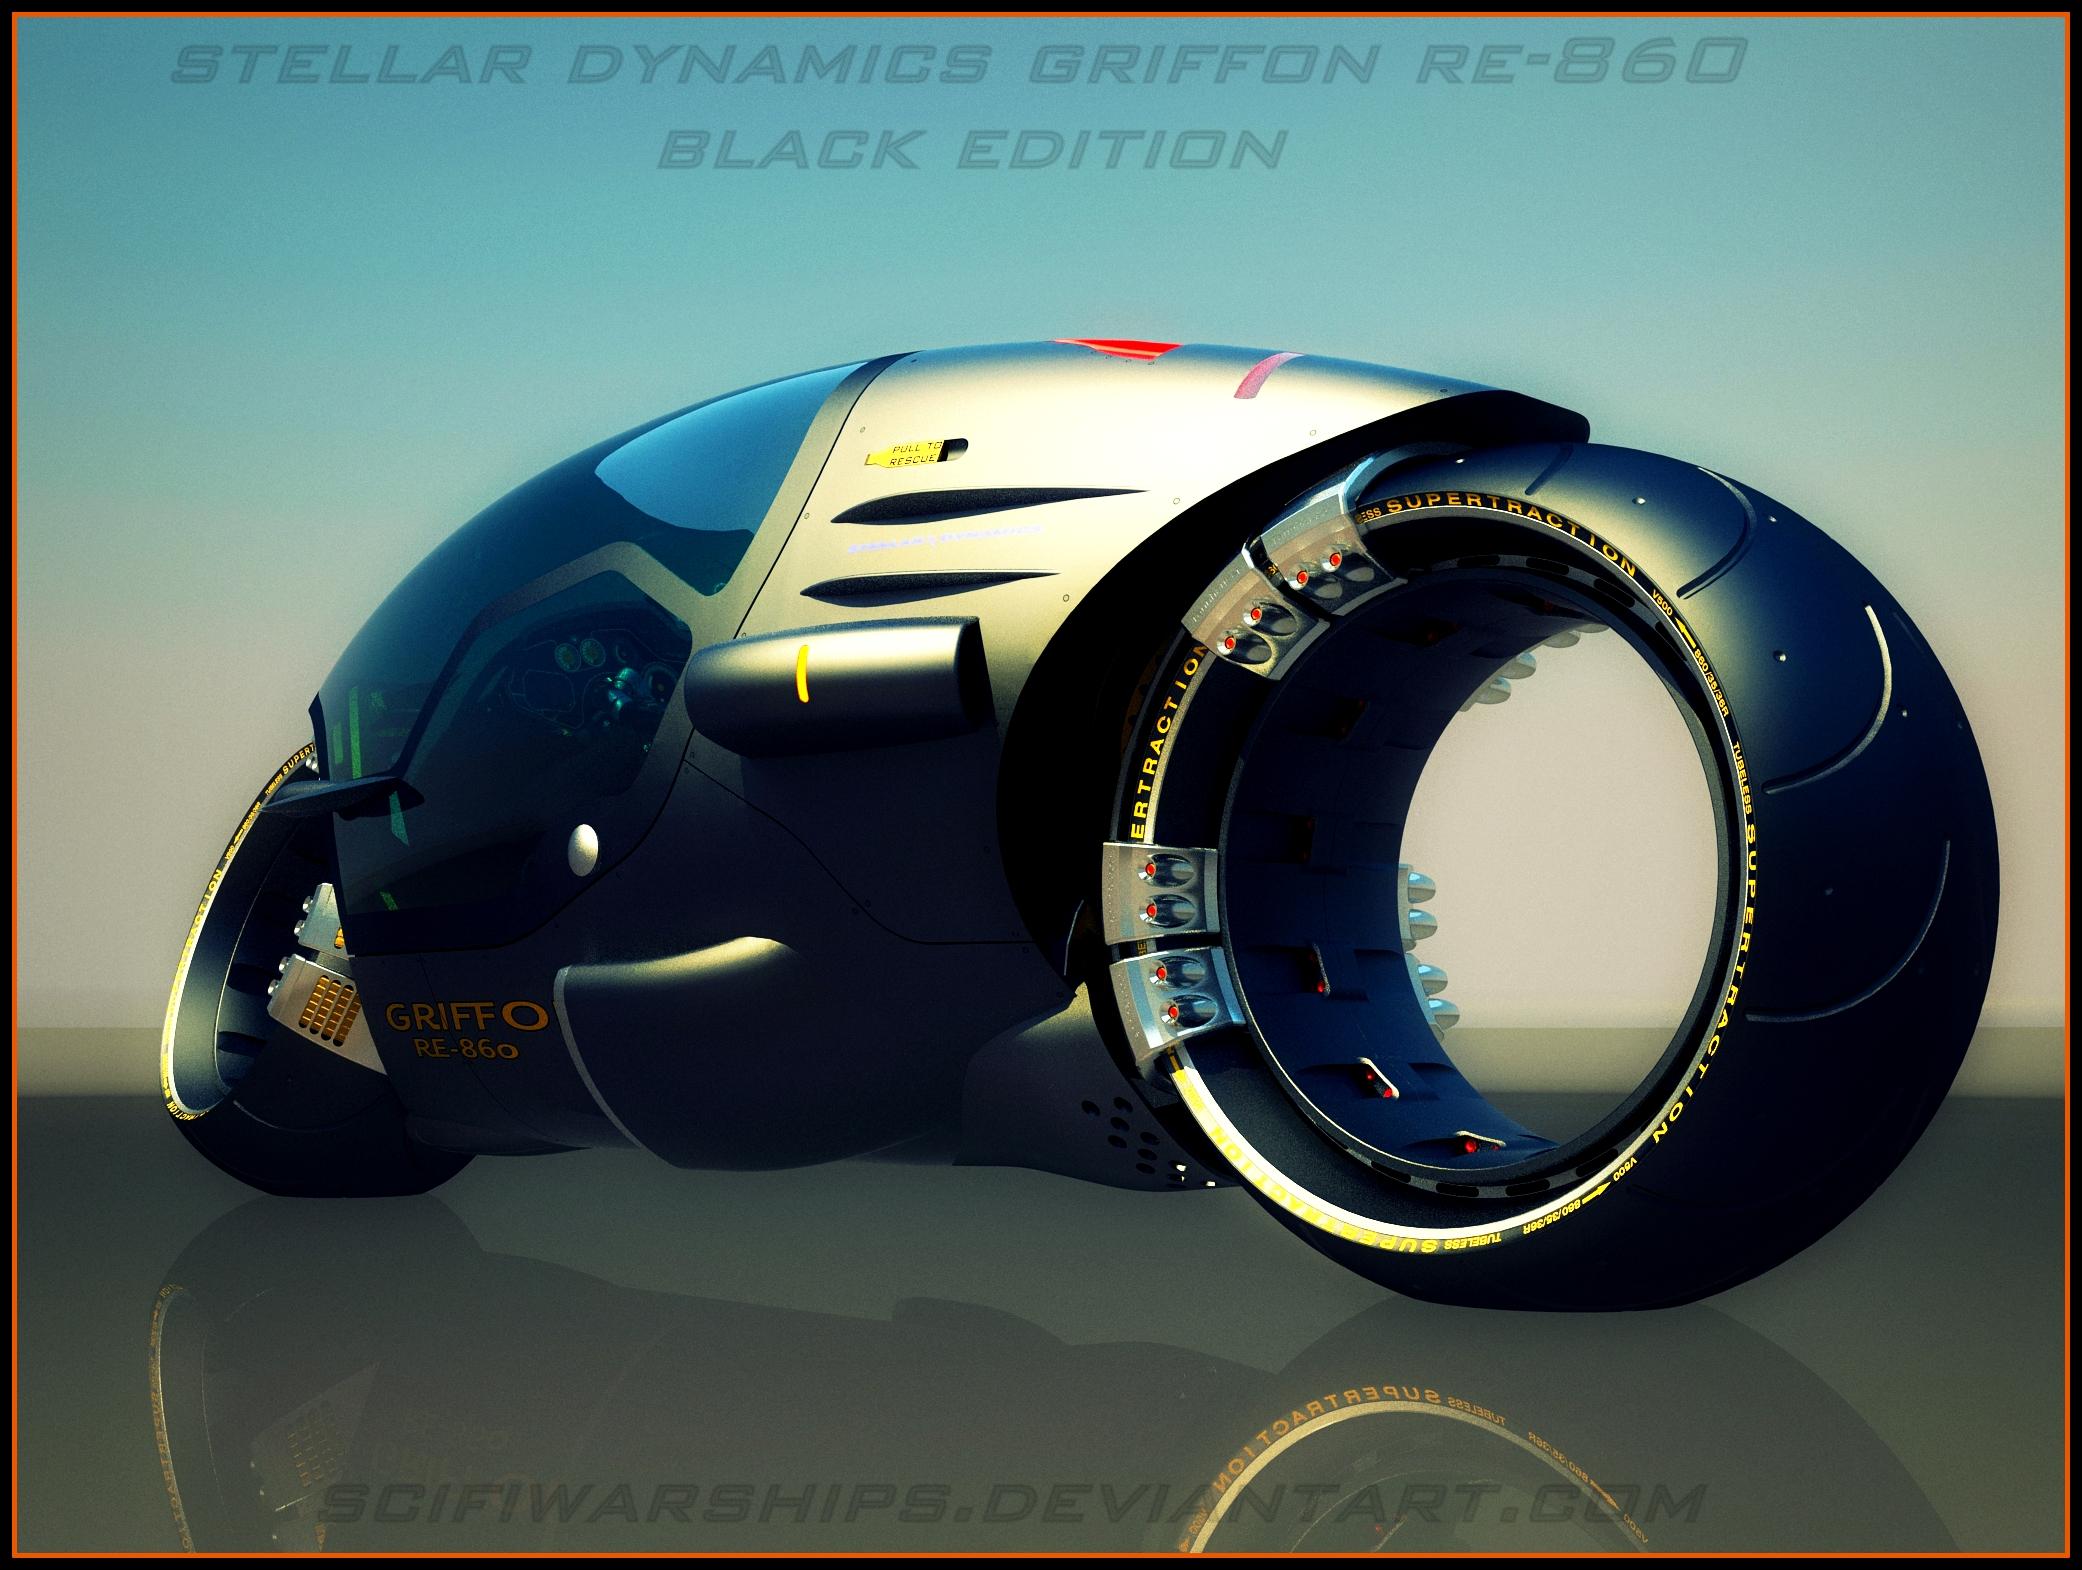 Penny Danvolt Stellar_dynamics_griffon_re_860_black_by_scifiwarships-d5j2zh0